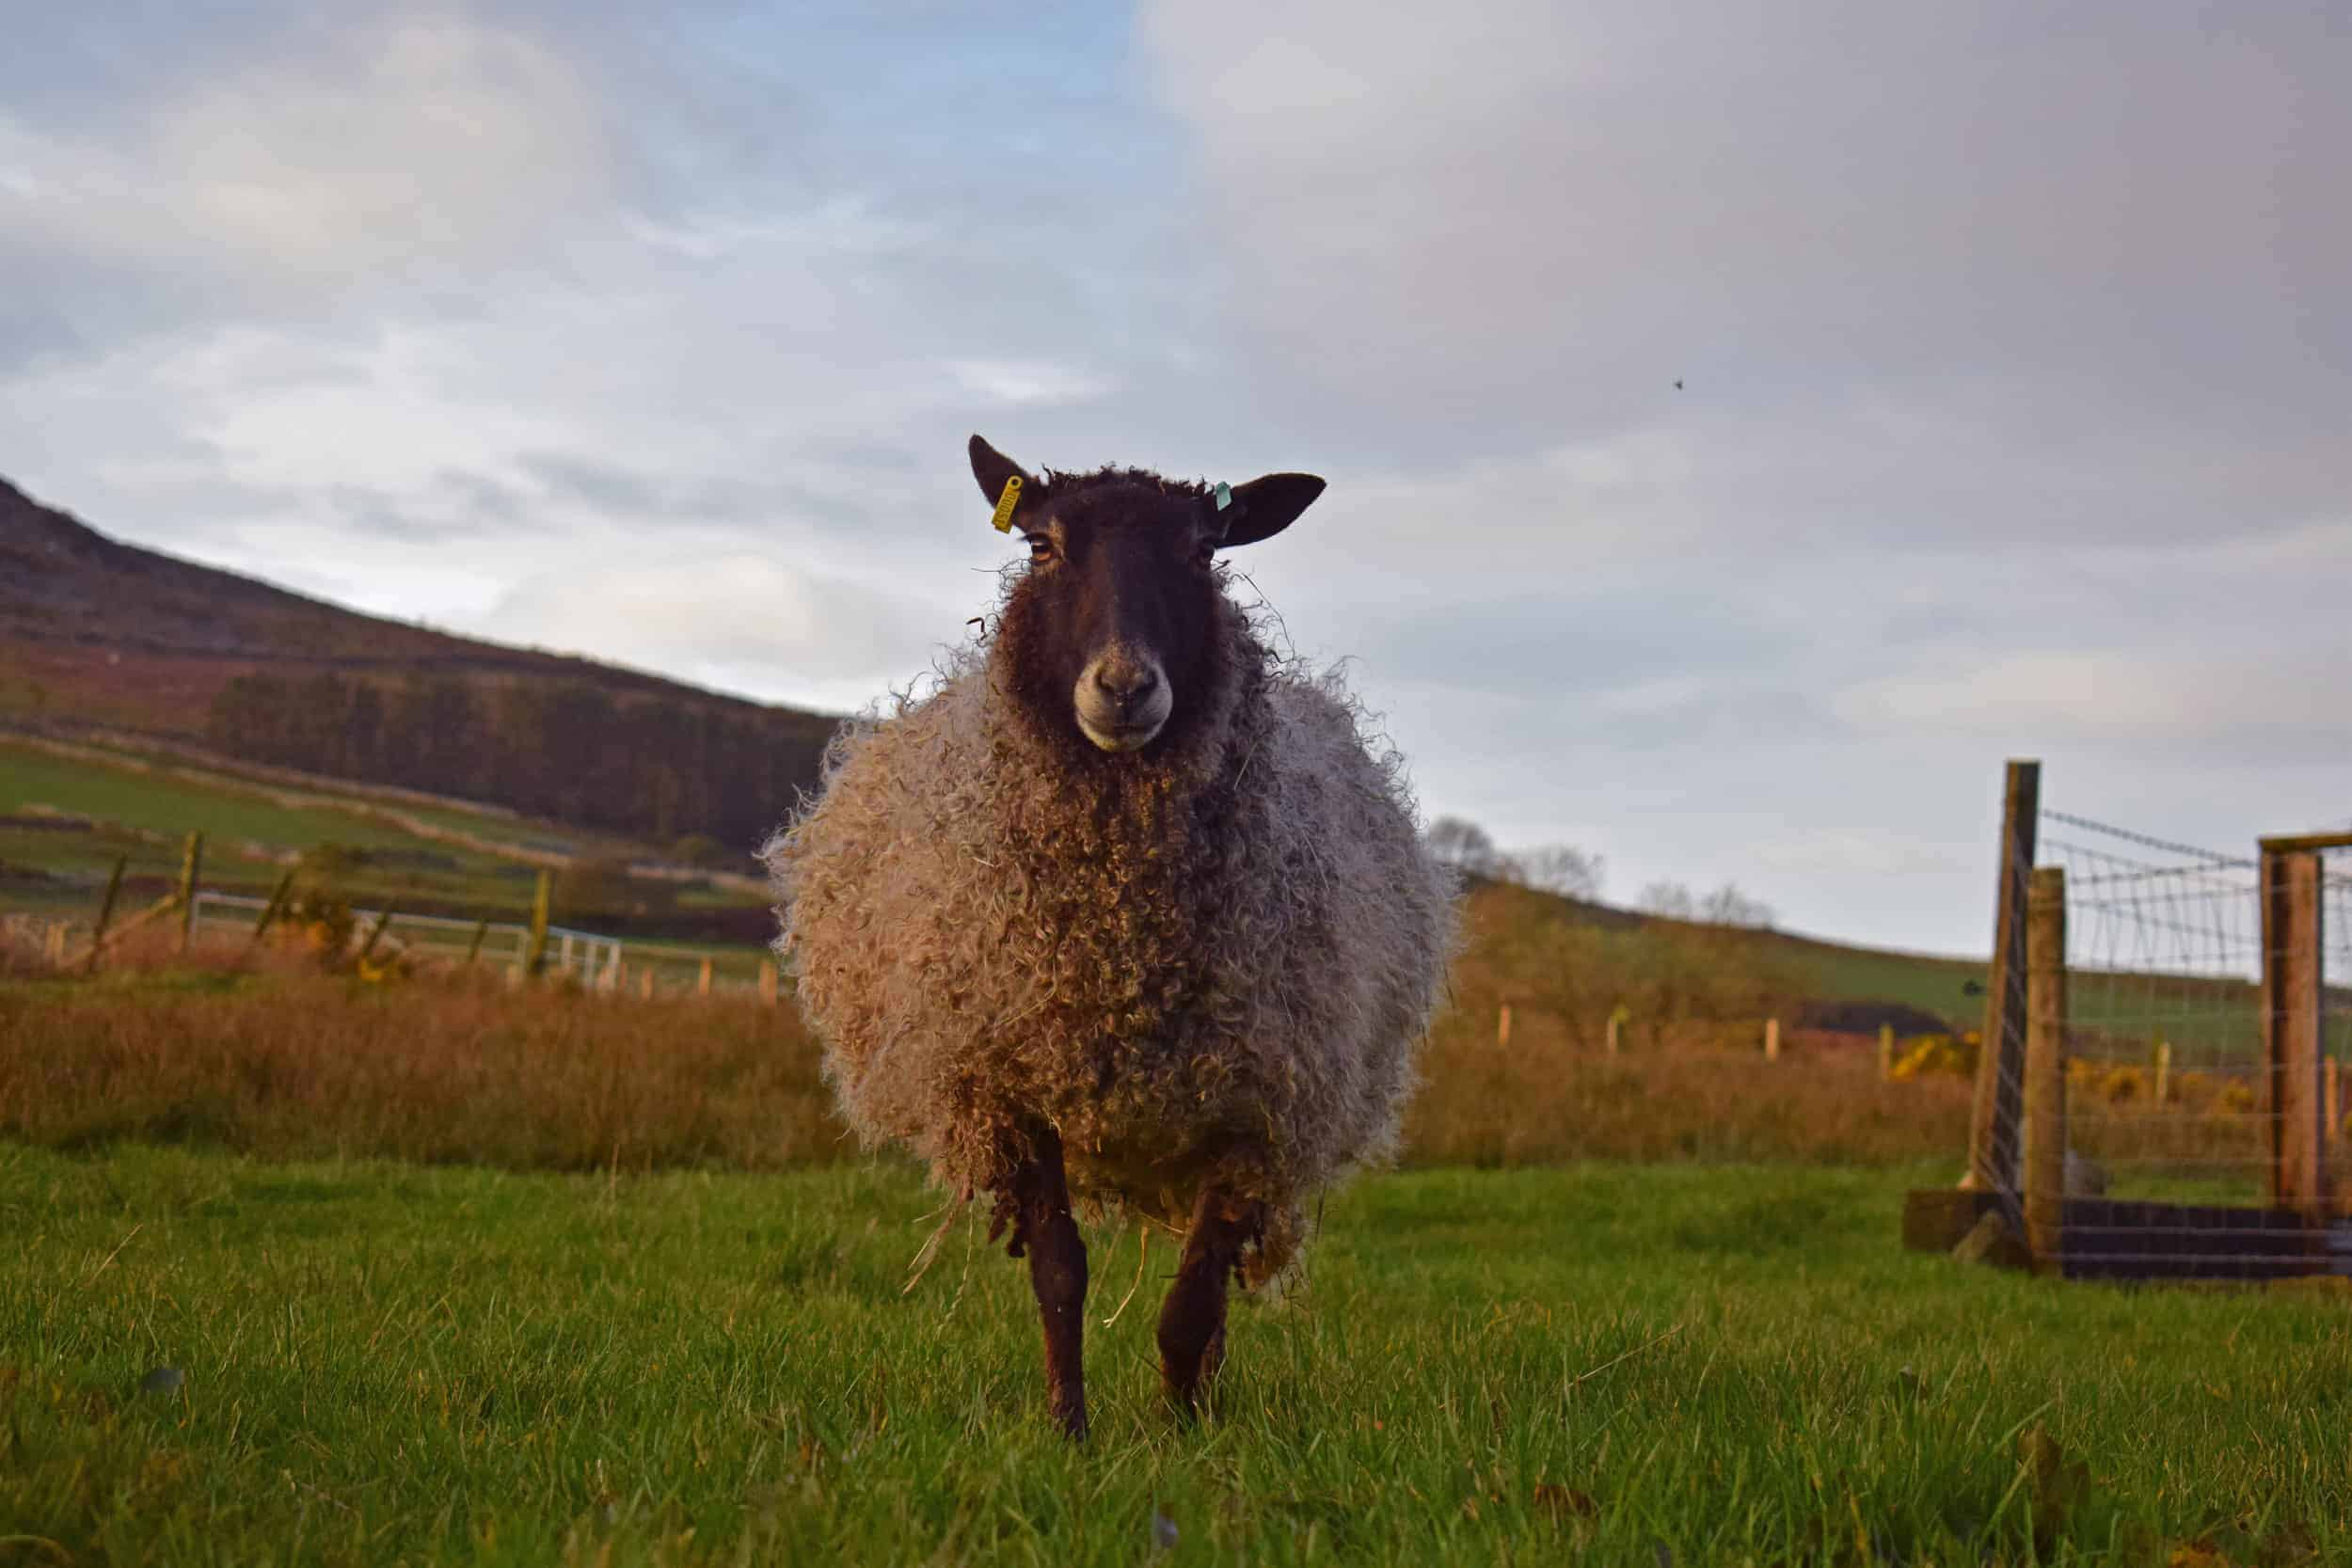 frieda patchwork sheep gotland in lamb pregnant